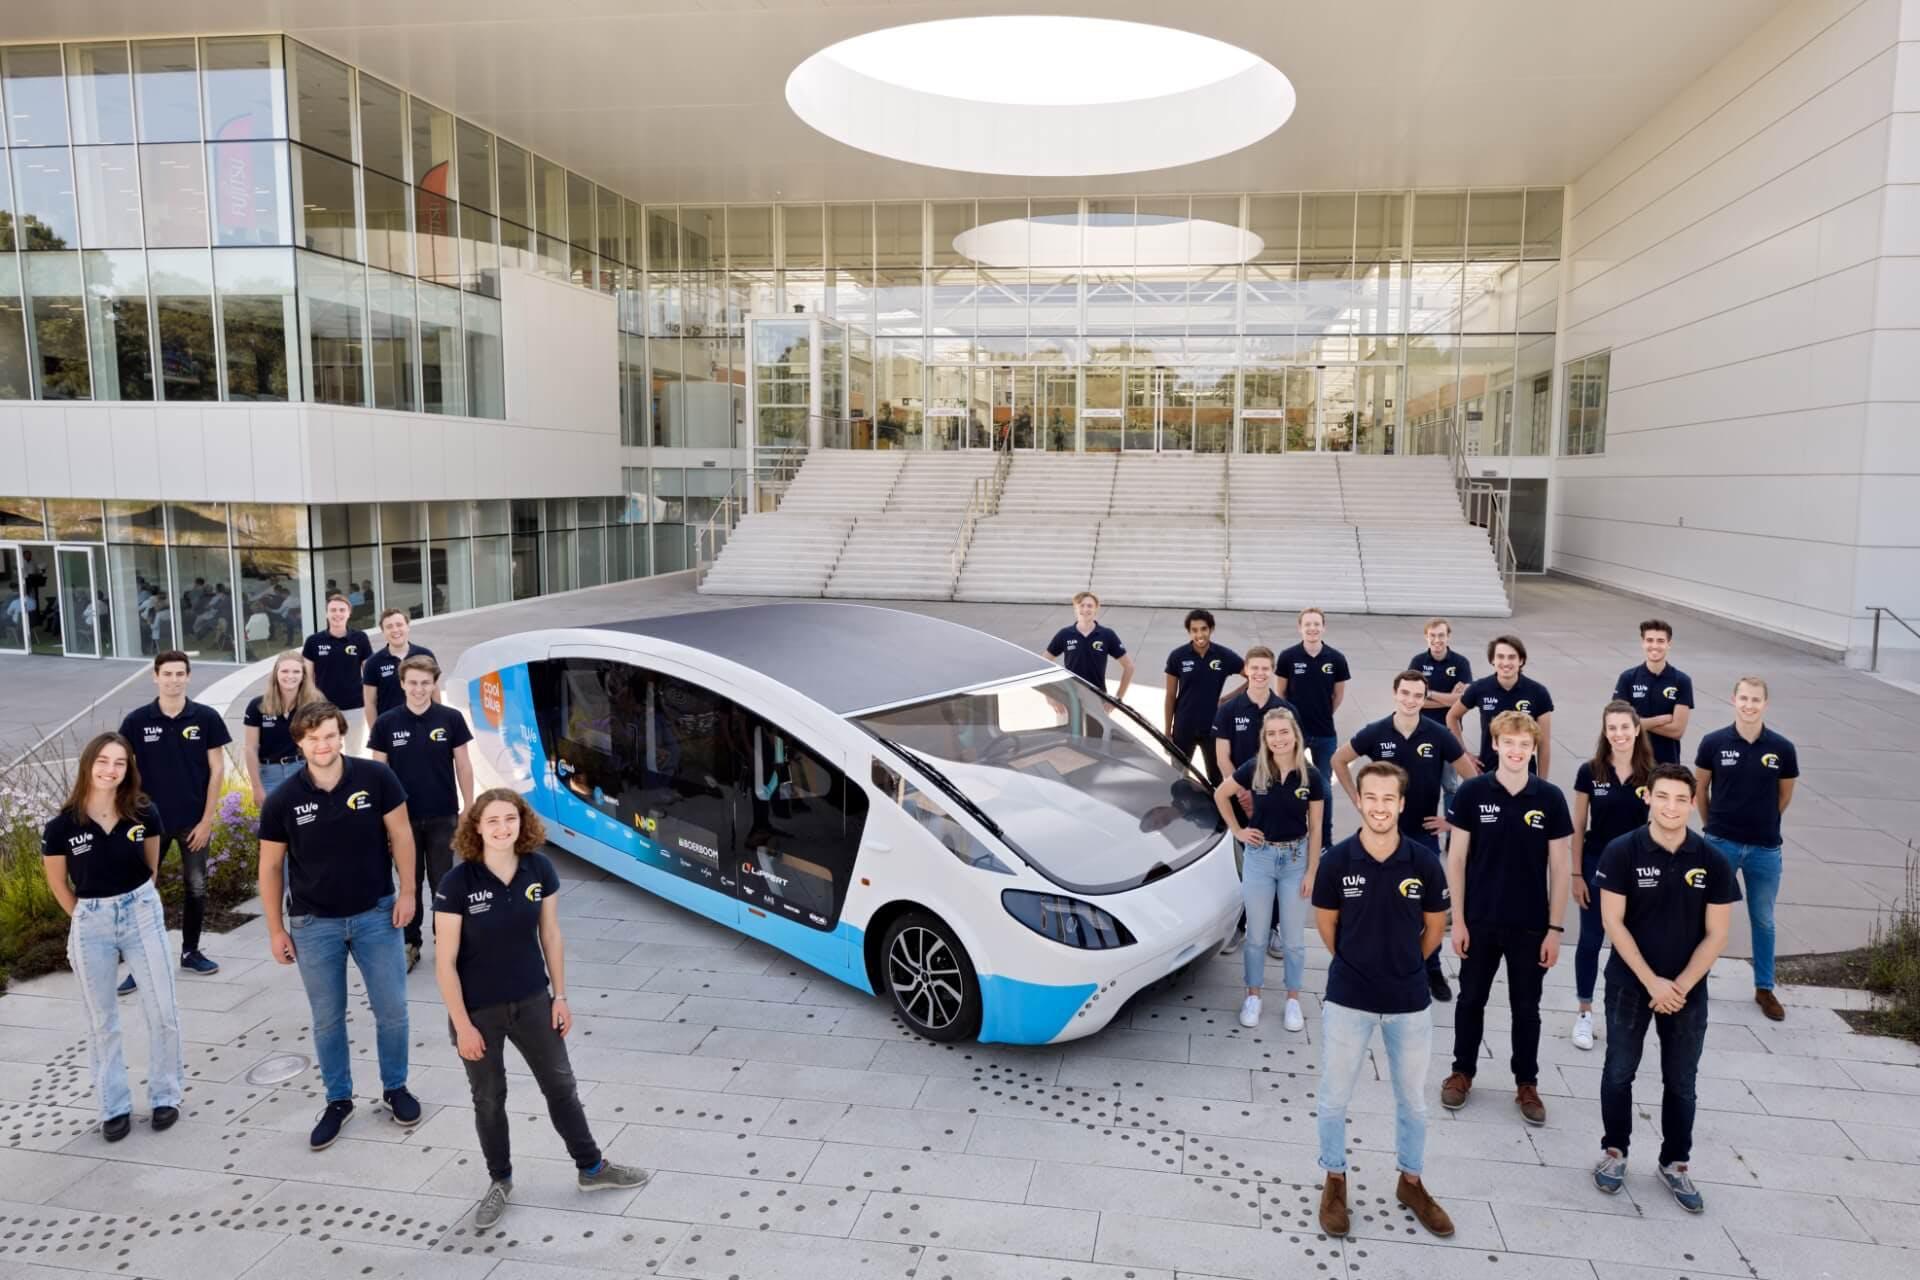 Presenting our newest solar-vehicle: Stella Vita!